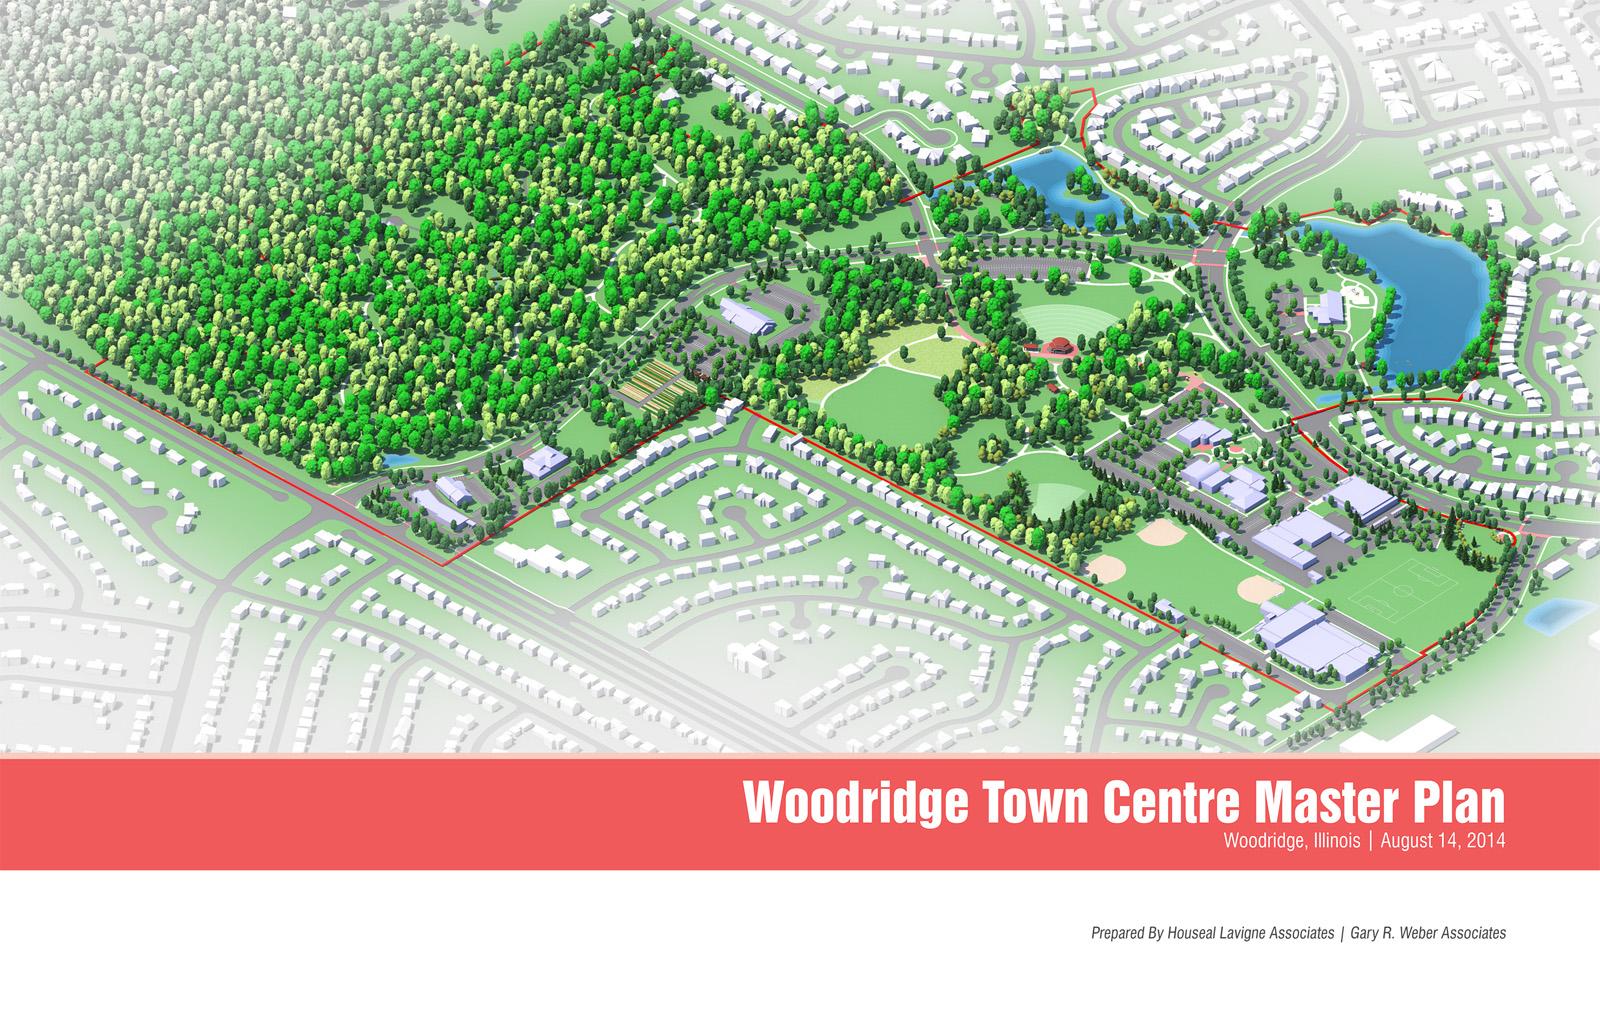 http://www.hlplanning.com/portals/wp-content/uploads/2014/10/Town-Centre-Master-Plan-1.jpg